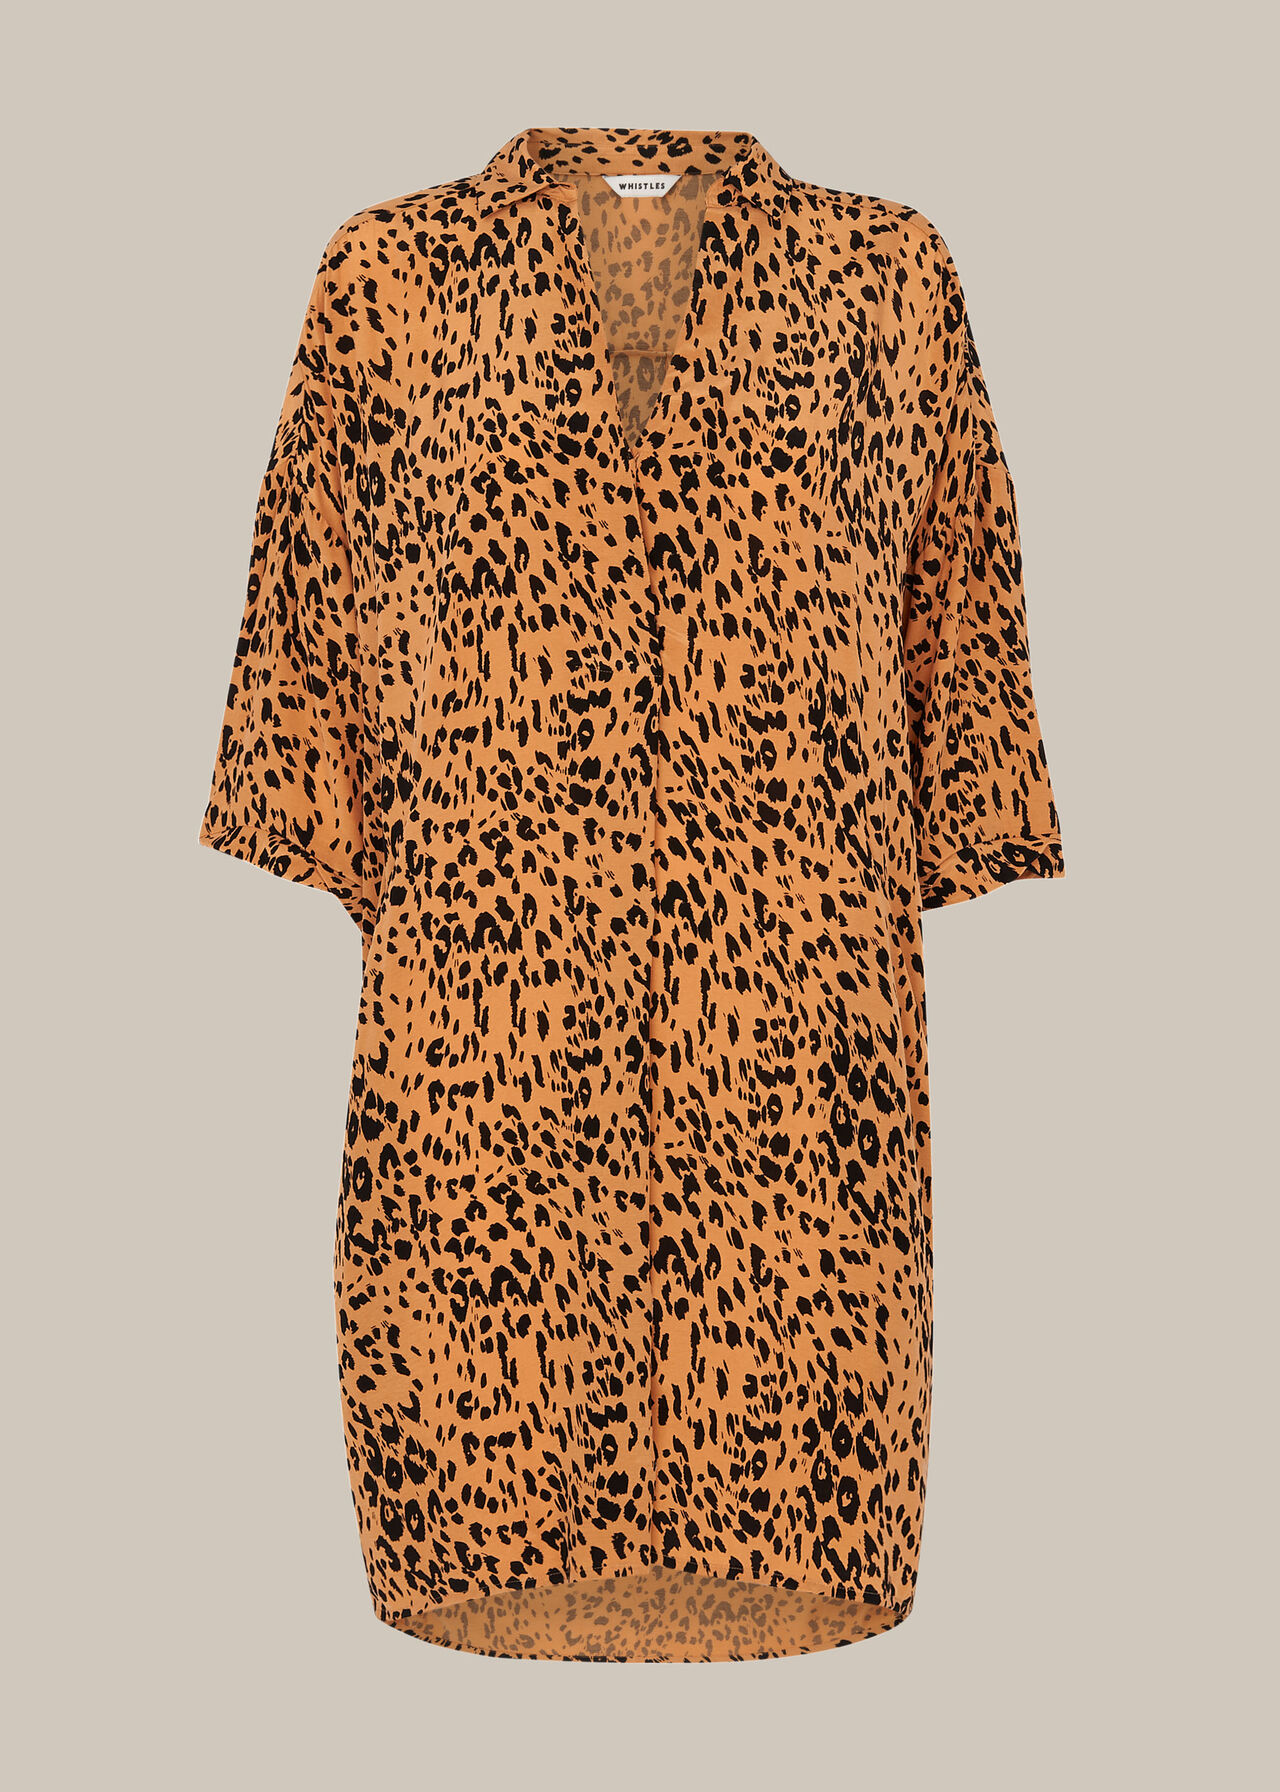 Safari Print Lola Dress